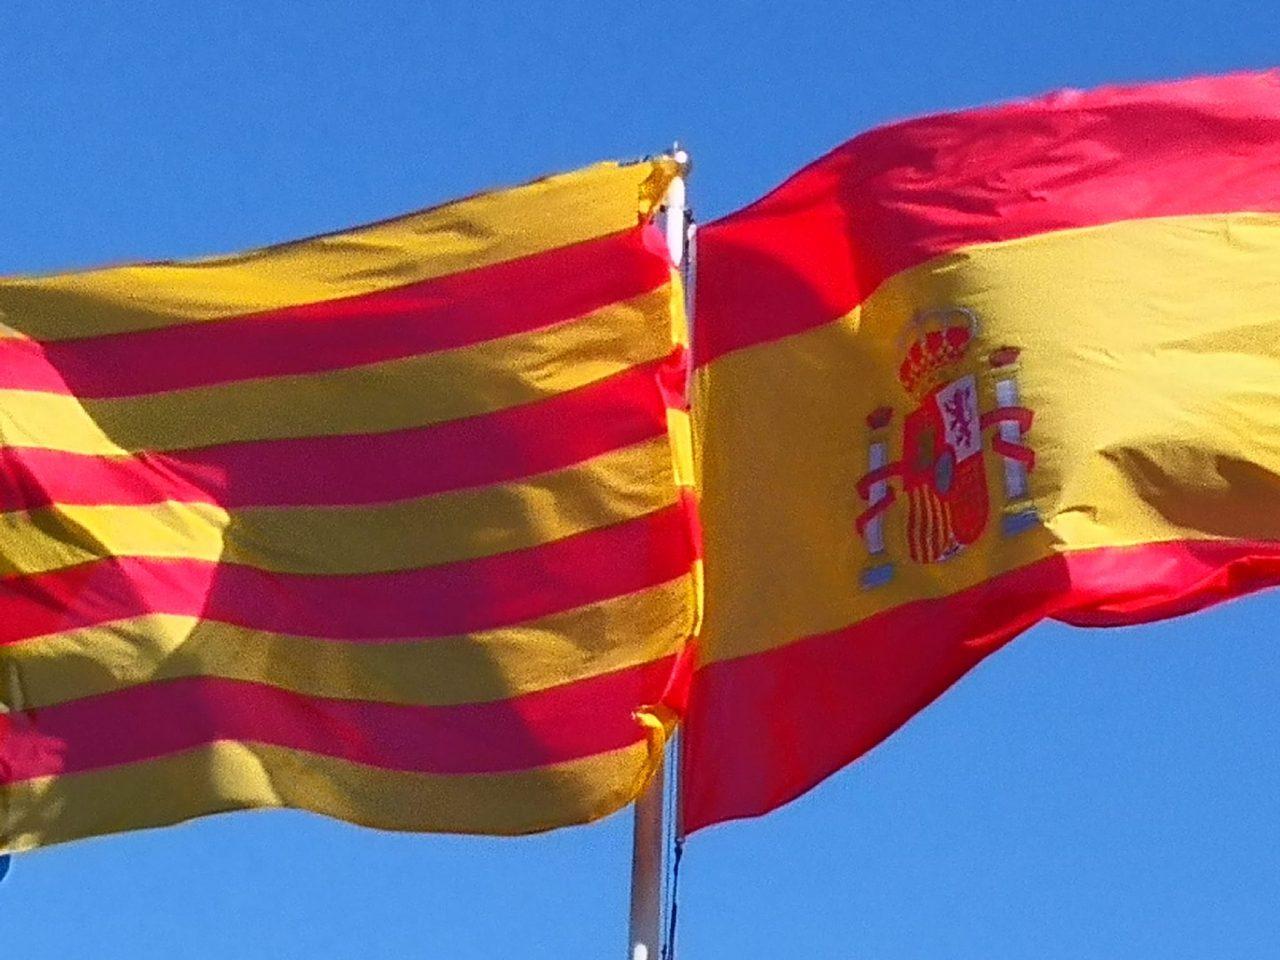 banderes-1280x960.jpg